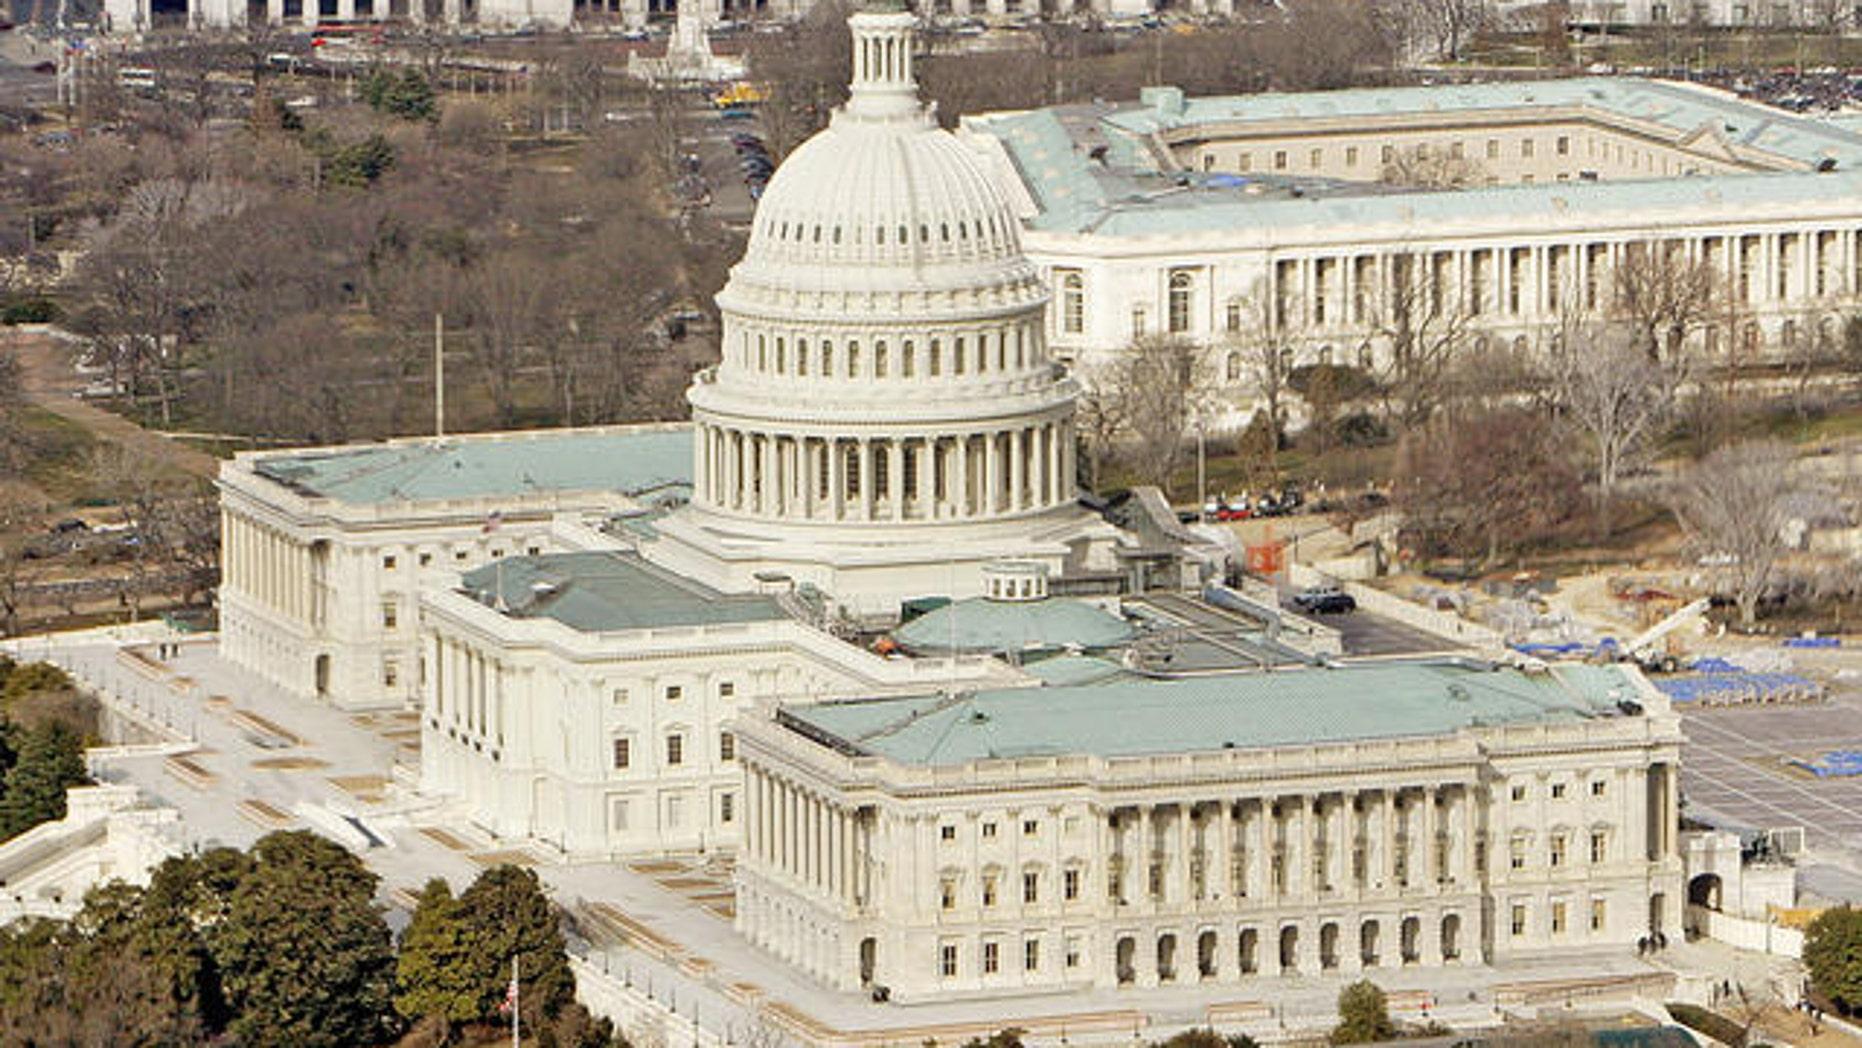 The U.S. Capitol in Washington, D.C. (AP)